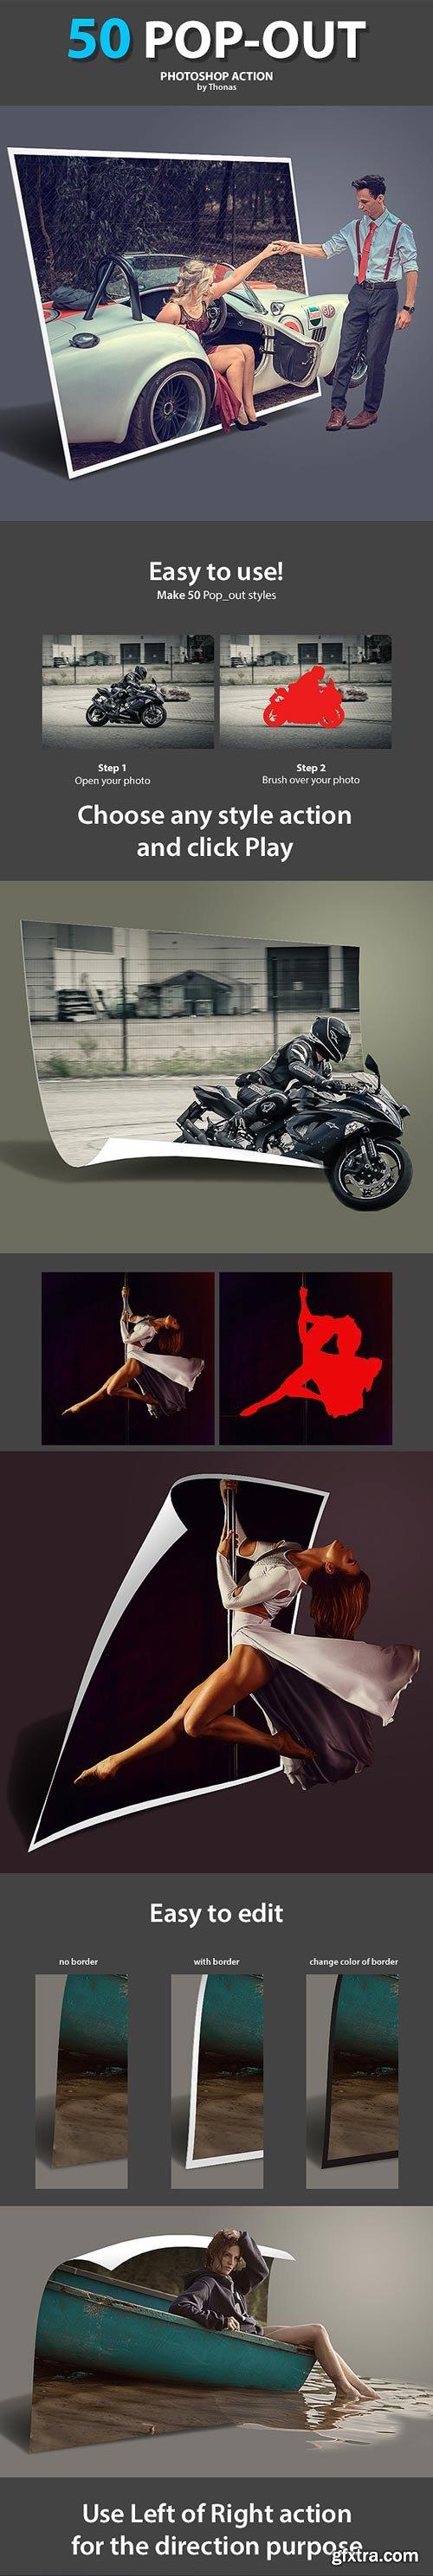 GraphicRiver - 50 Pop-out Photoshop Action - 22738573